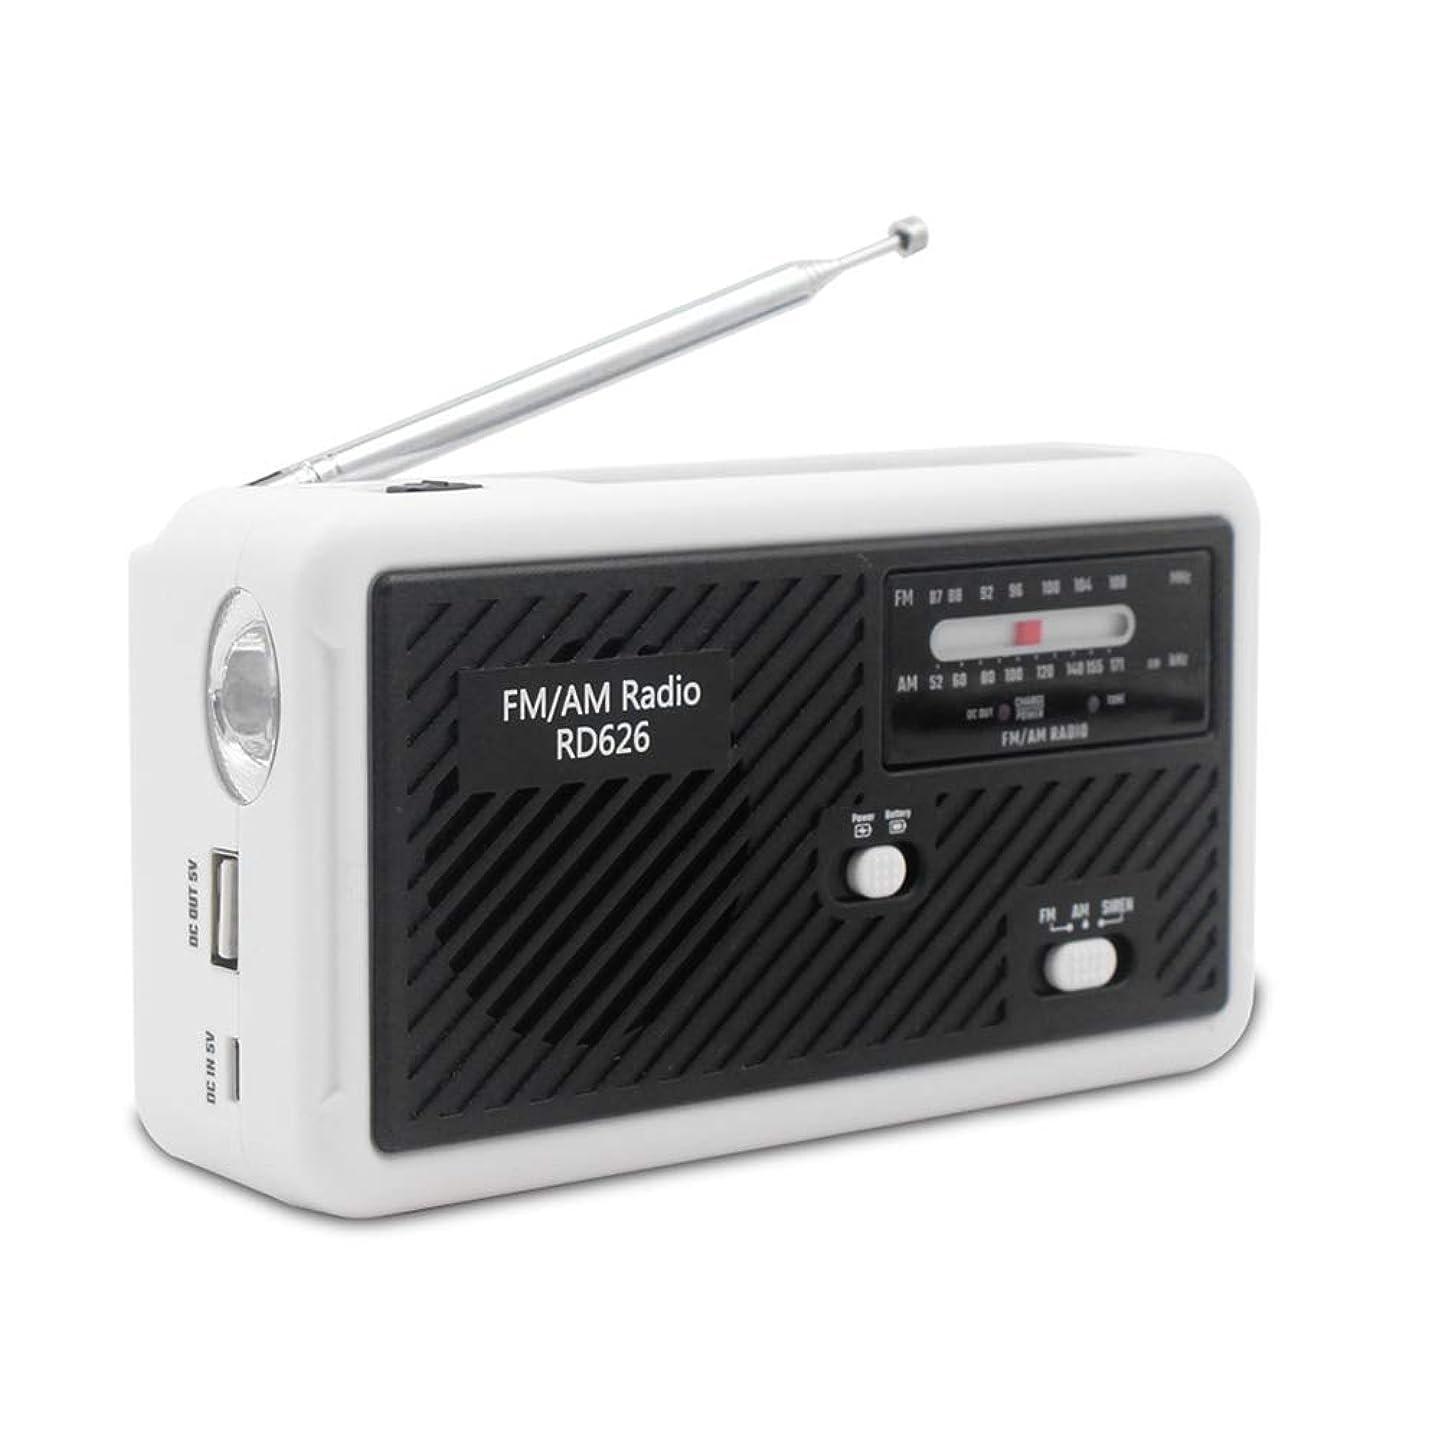 Docooler RD626 FM AM Dual-Band Digital Radio Power Bank 1000mAh Rechargeable Battery Solar Hand-Crank Emergency LED Flashlight Siren Micro USB Charging